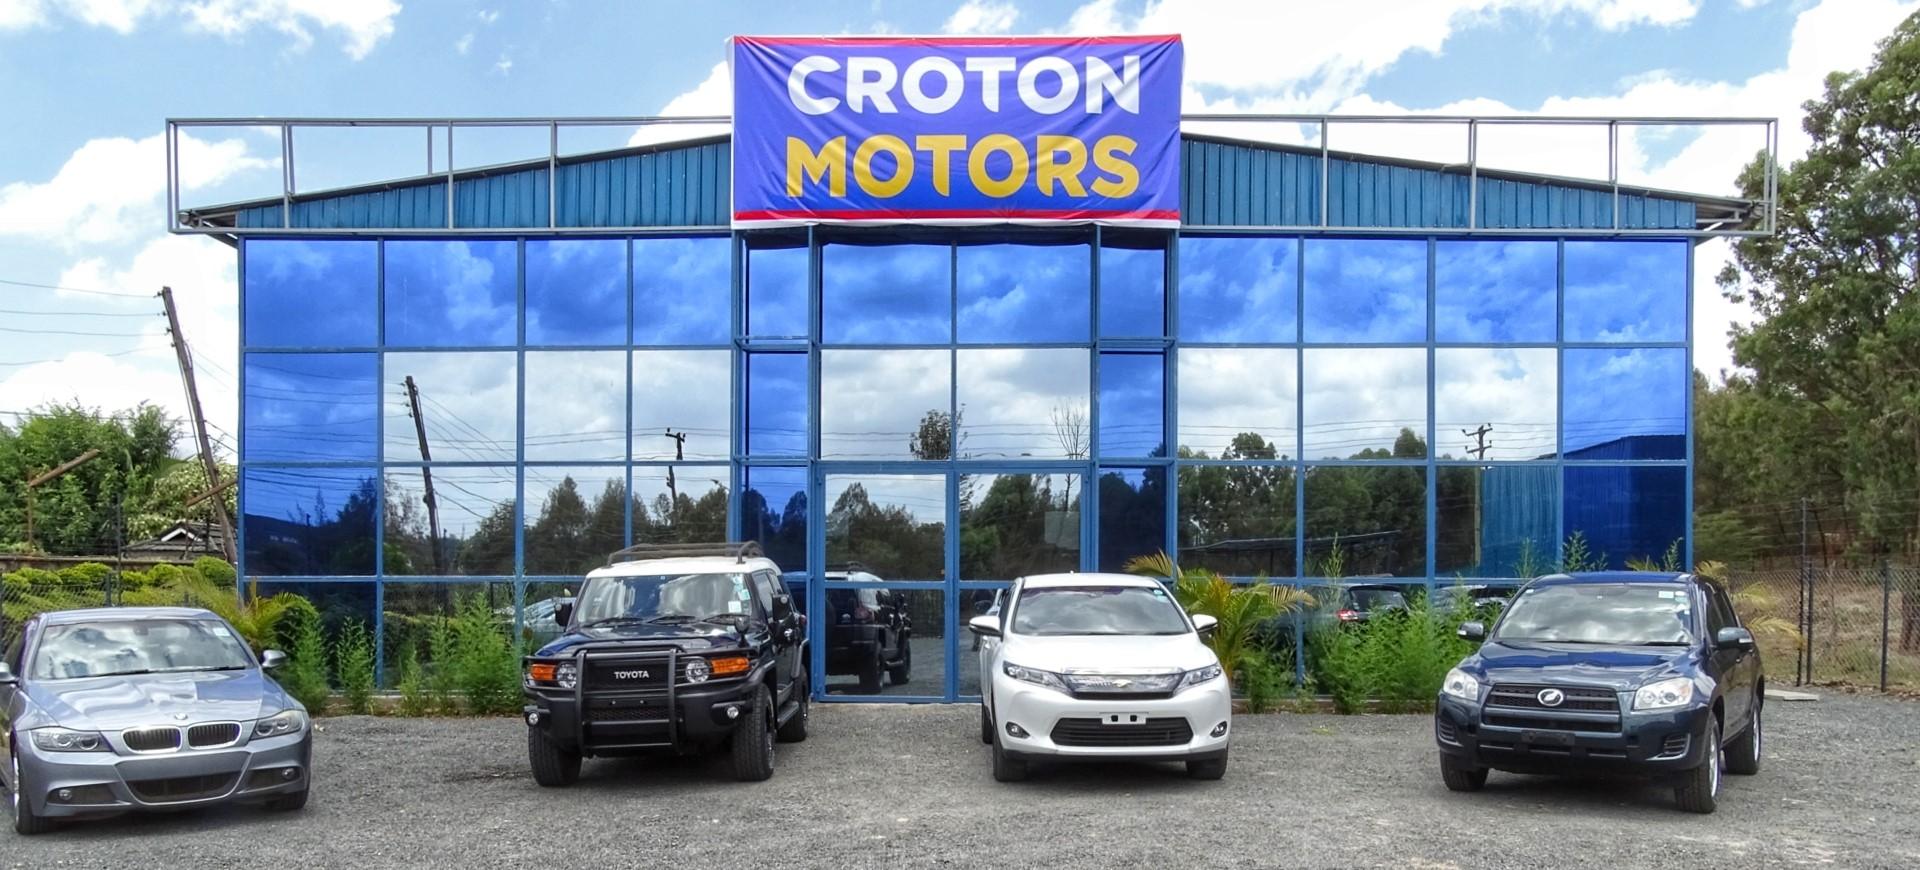 Croton Motors